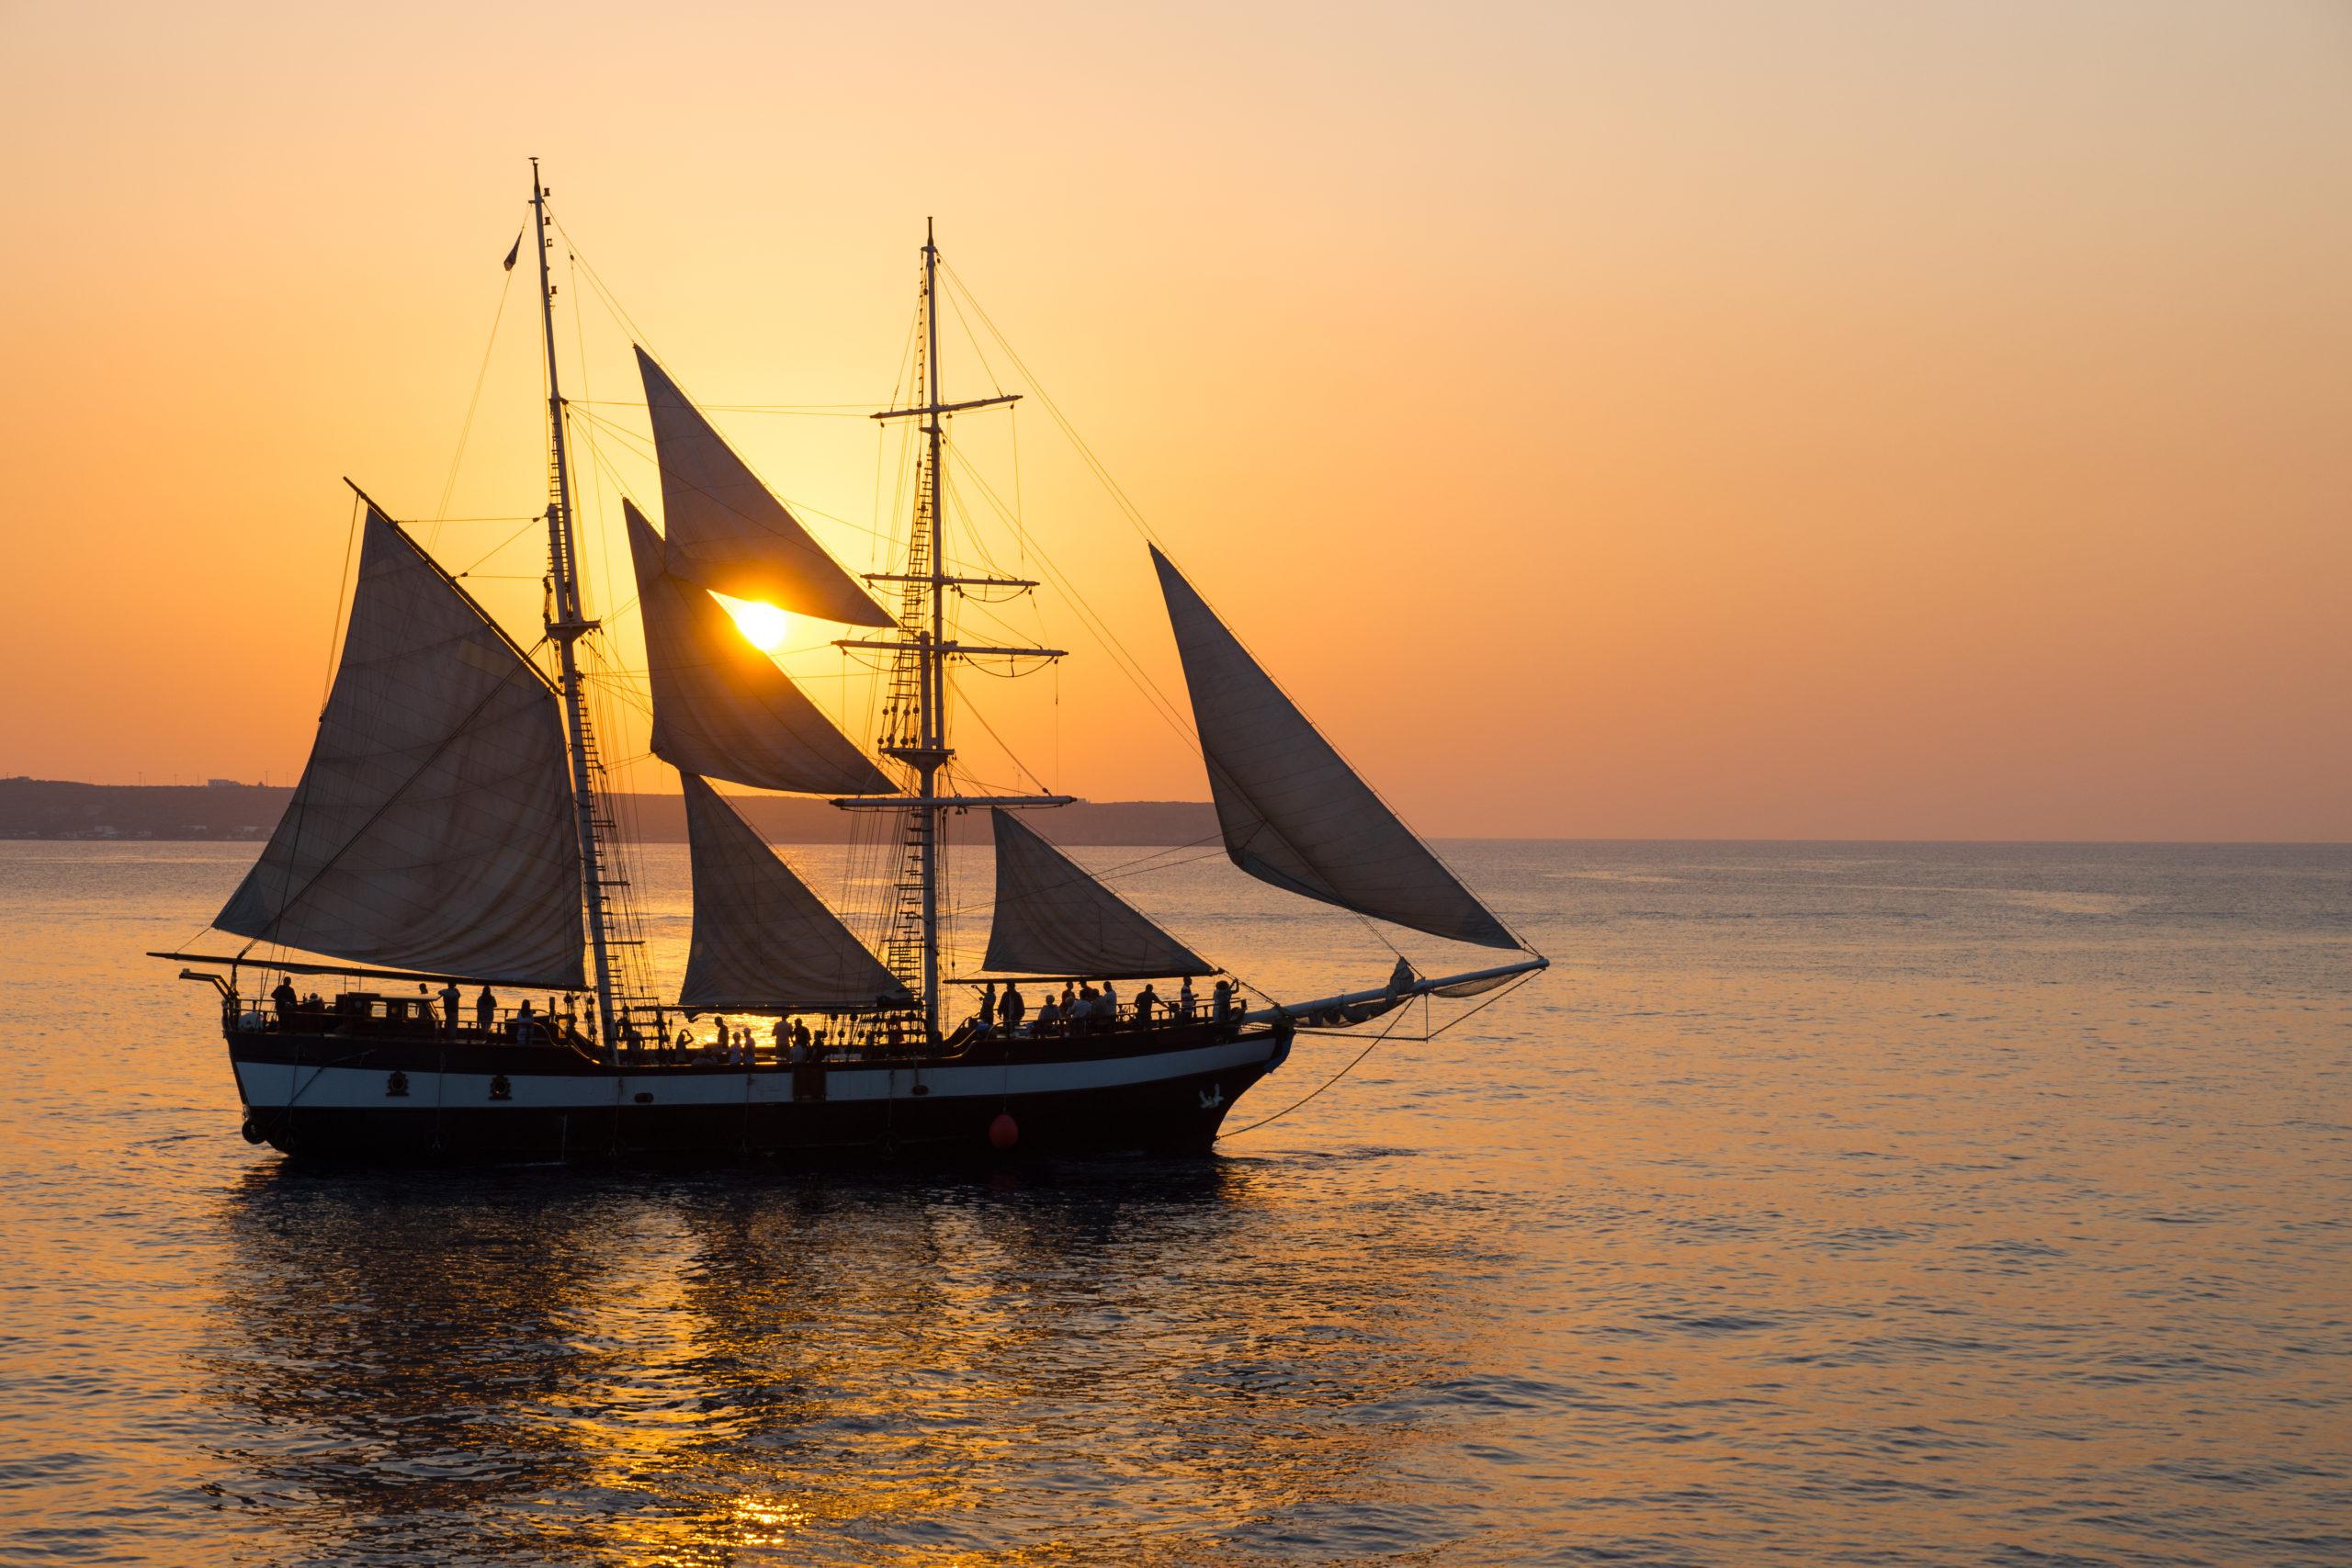 sailing-ship-at-sunset-P6U4ECE-scaled